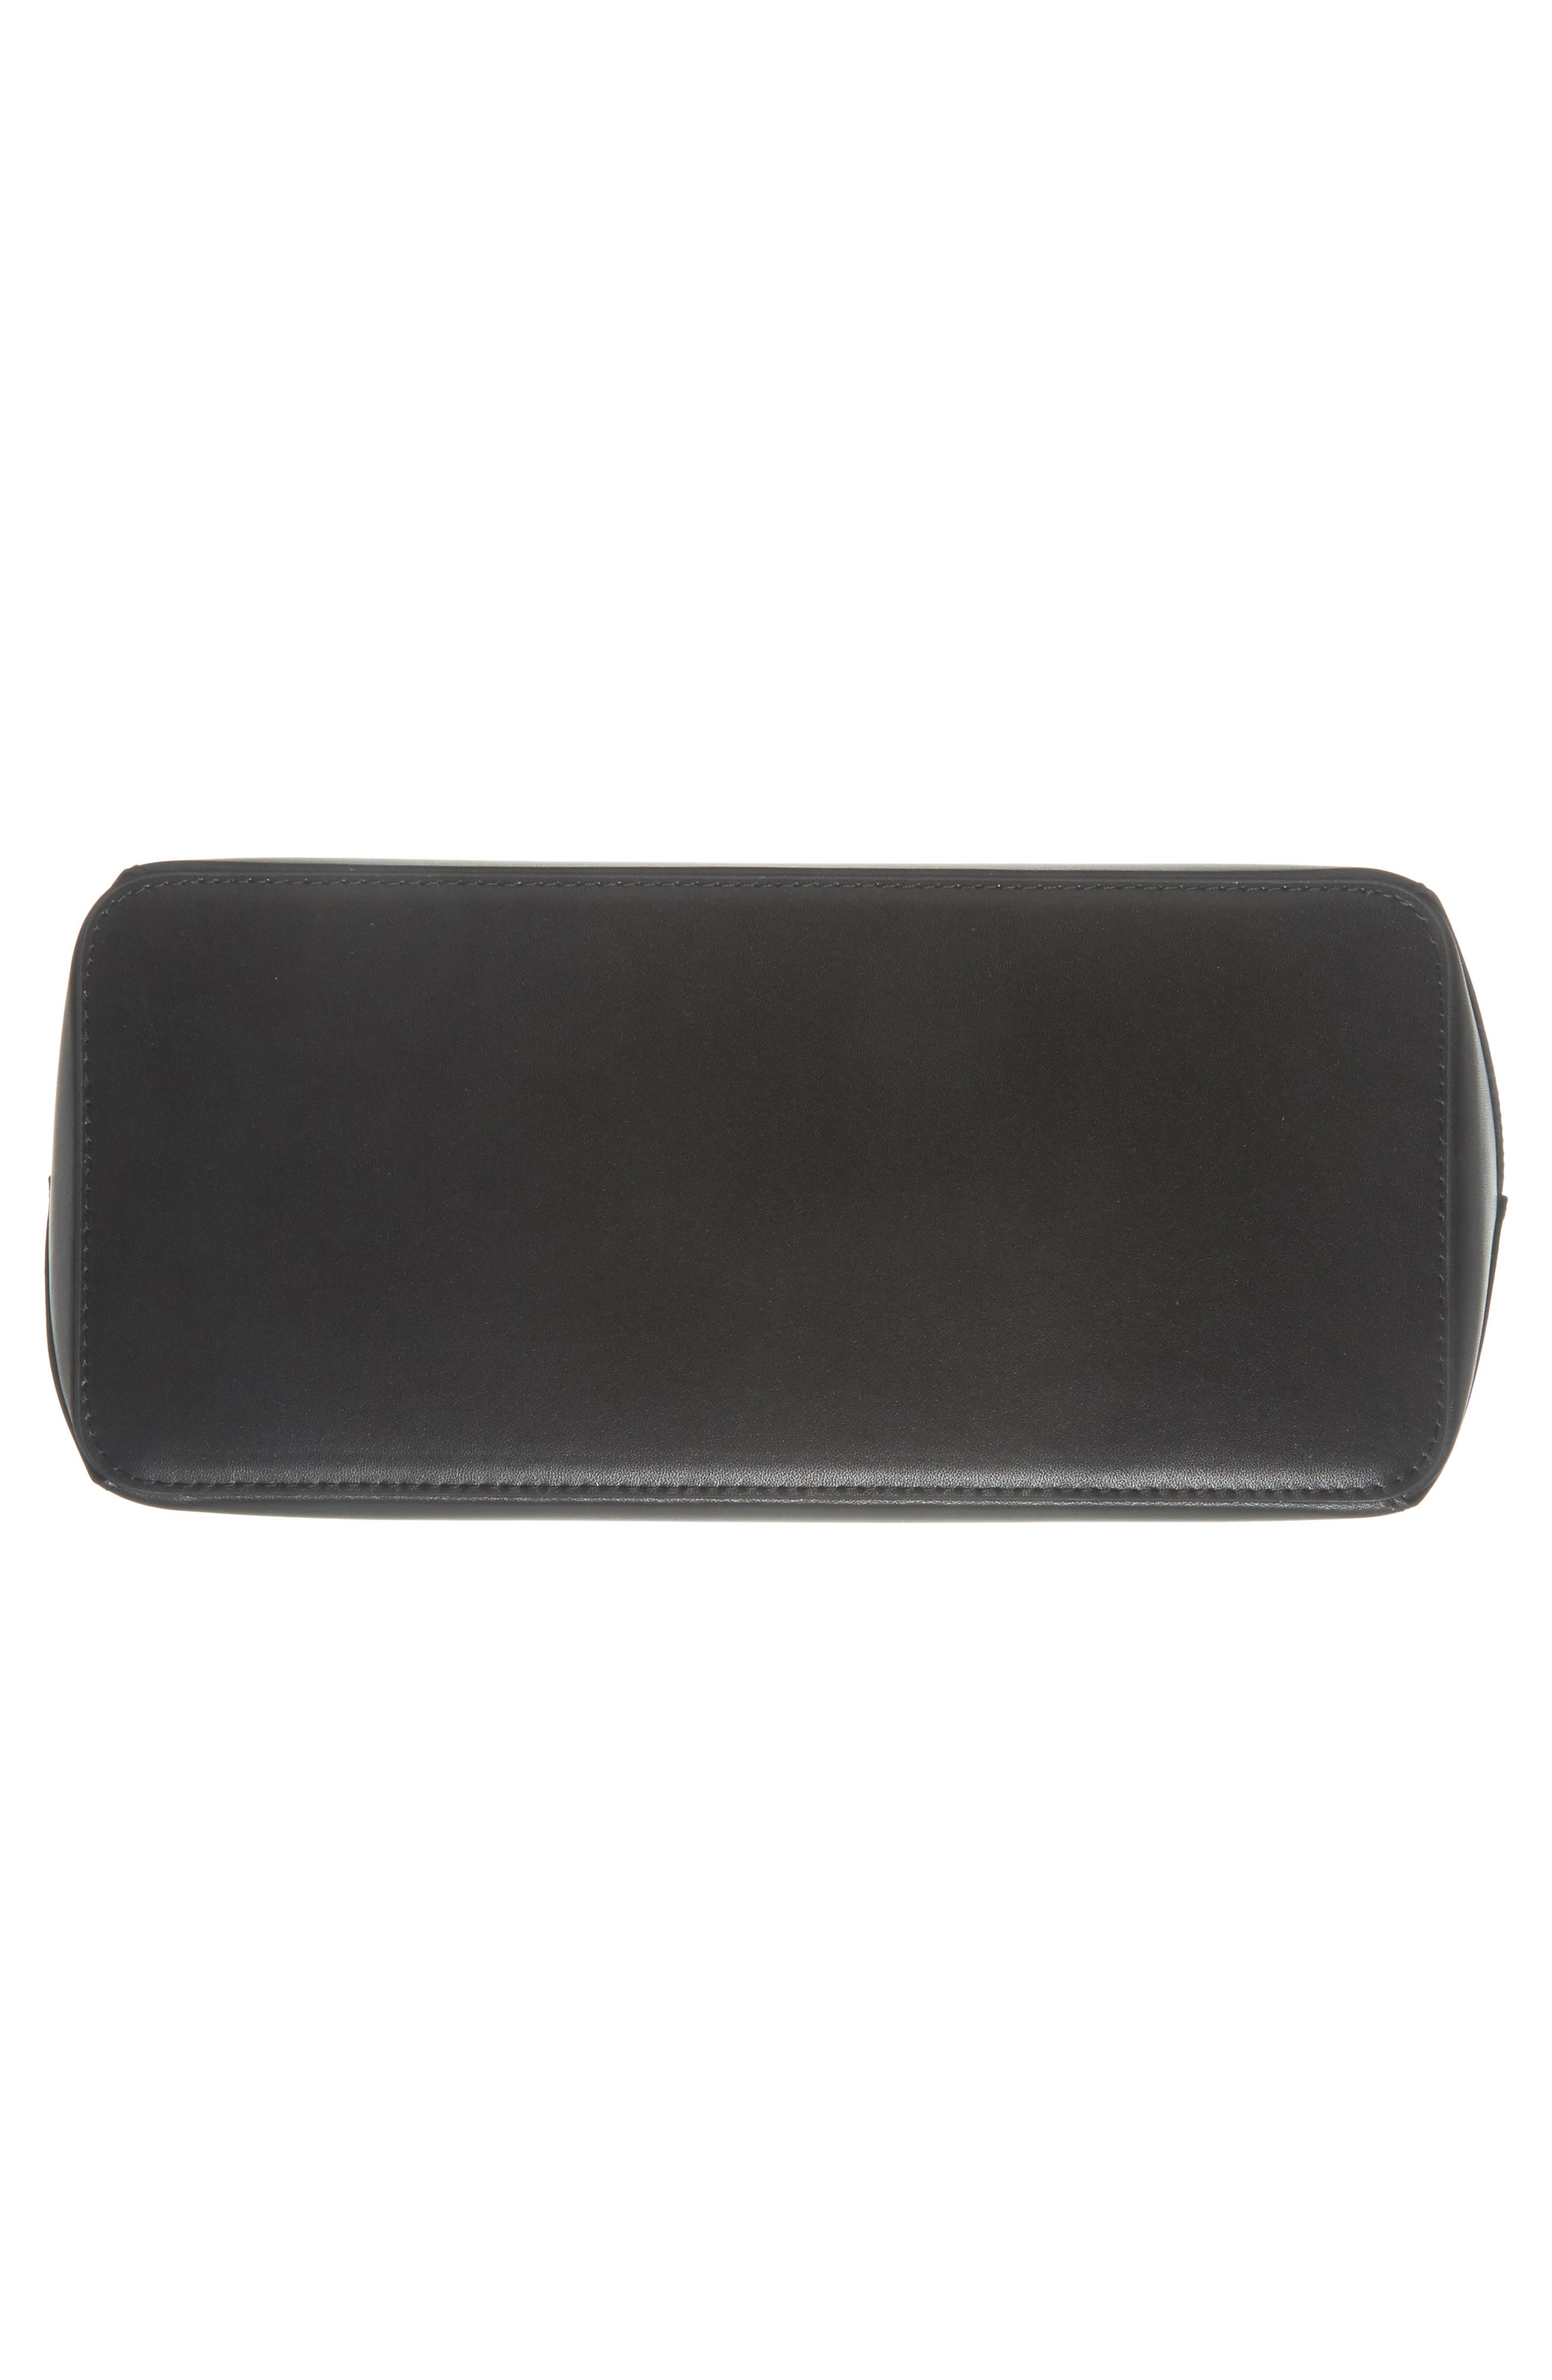 Jaceyy Adjustable Handle Leather Shopper,                             Alternate thumbnail 6, color,                             001